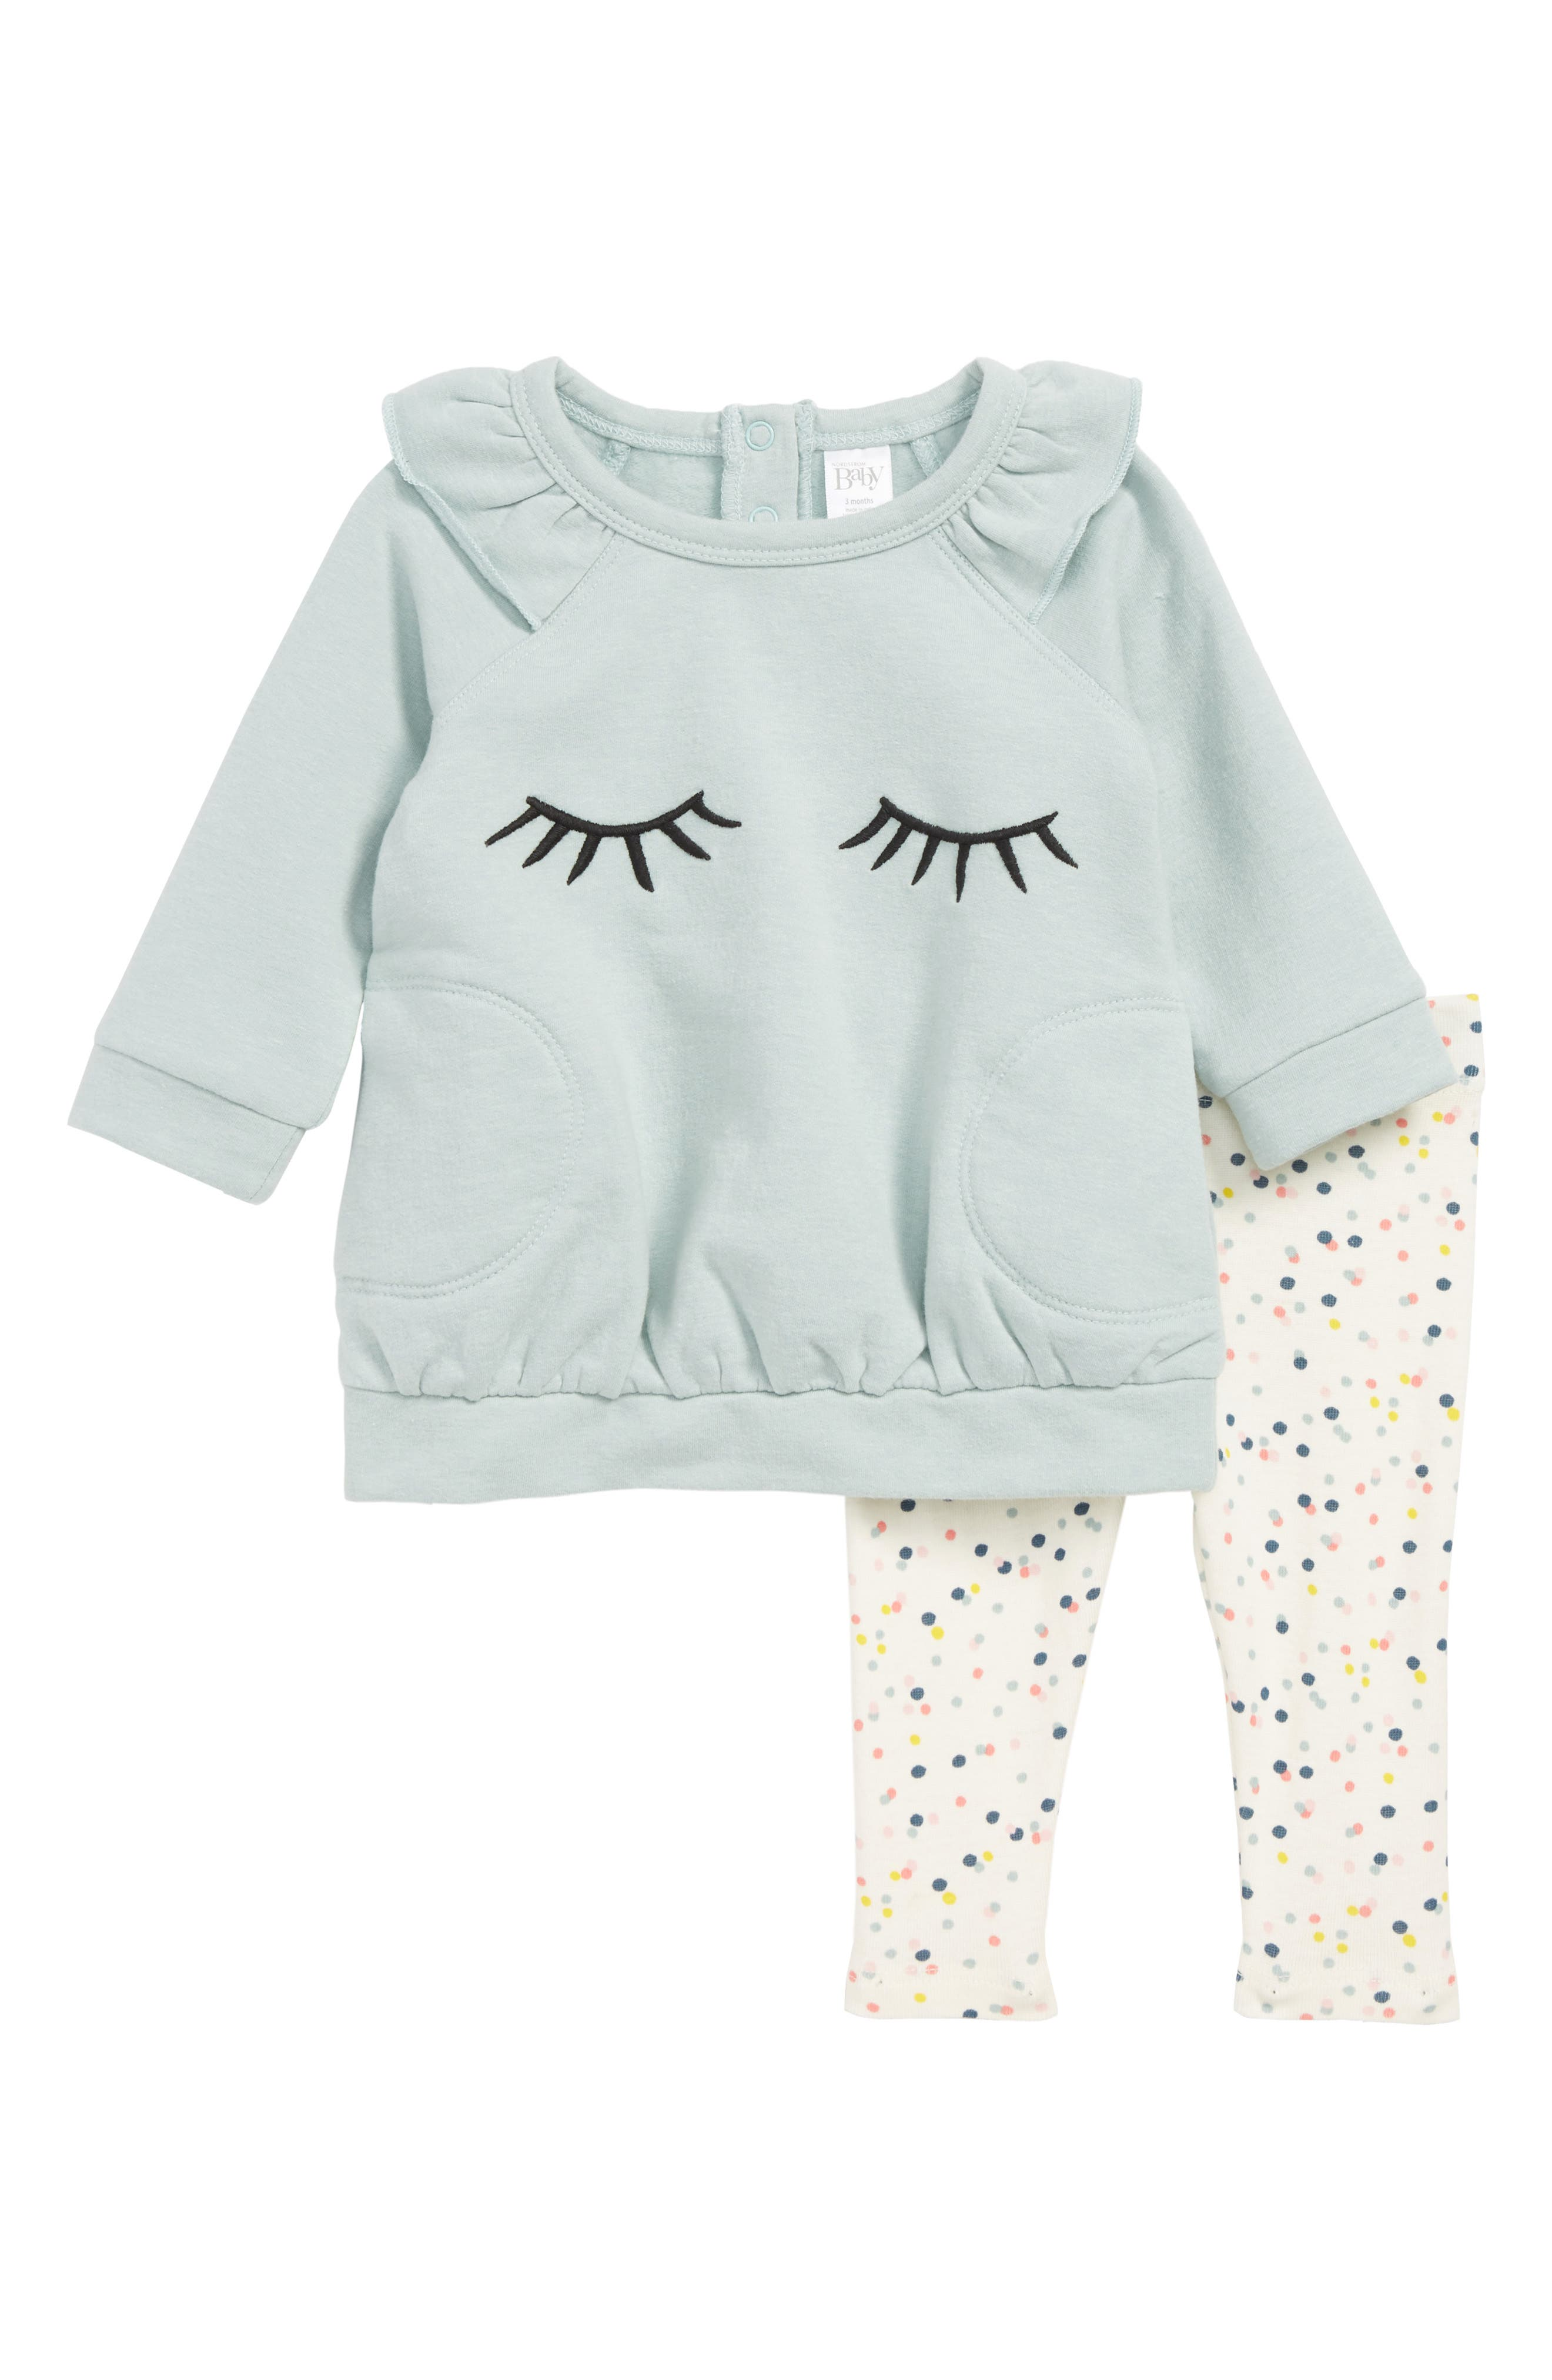 Ruffle Sweater & Leggings Set,                         Main,                         color, TEAL TIDE- IVORY EYELASHES